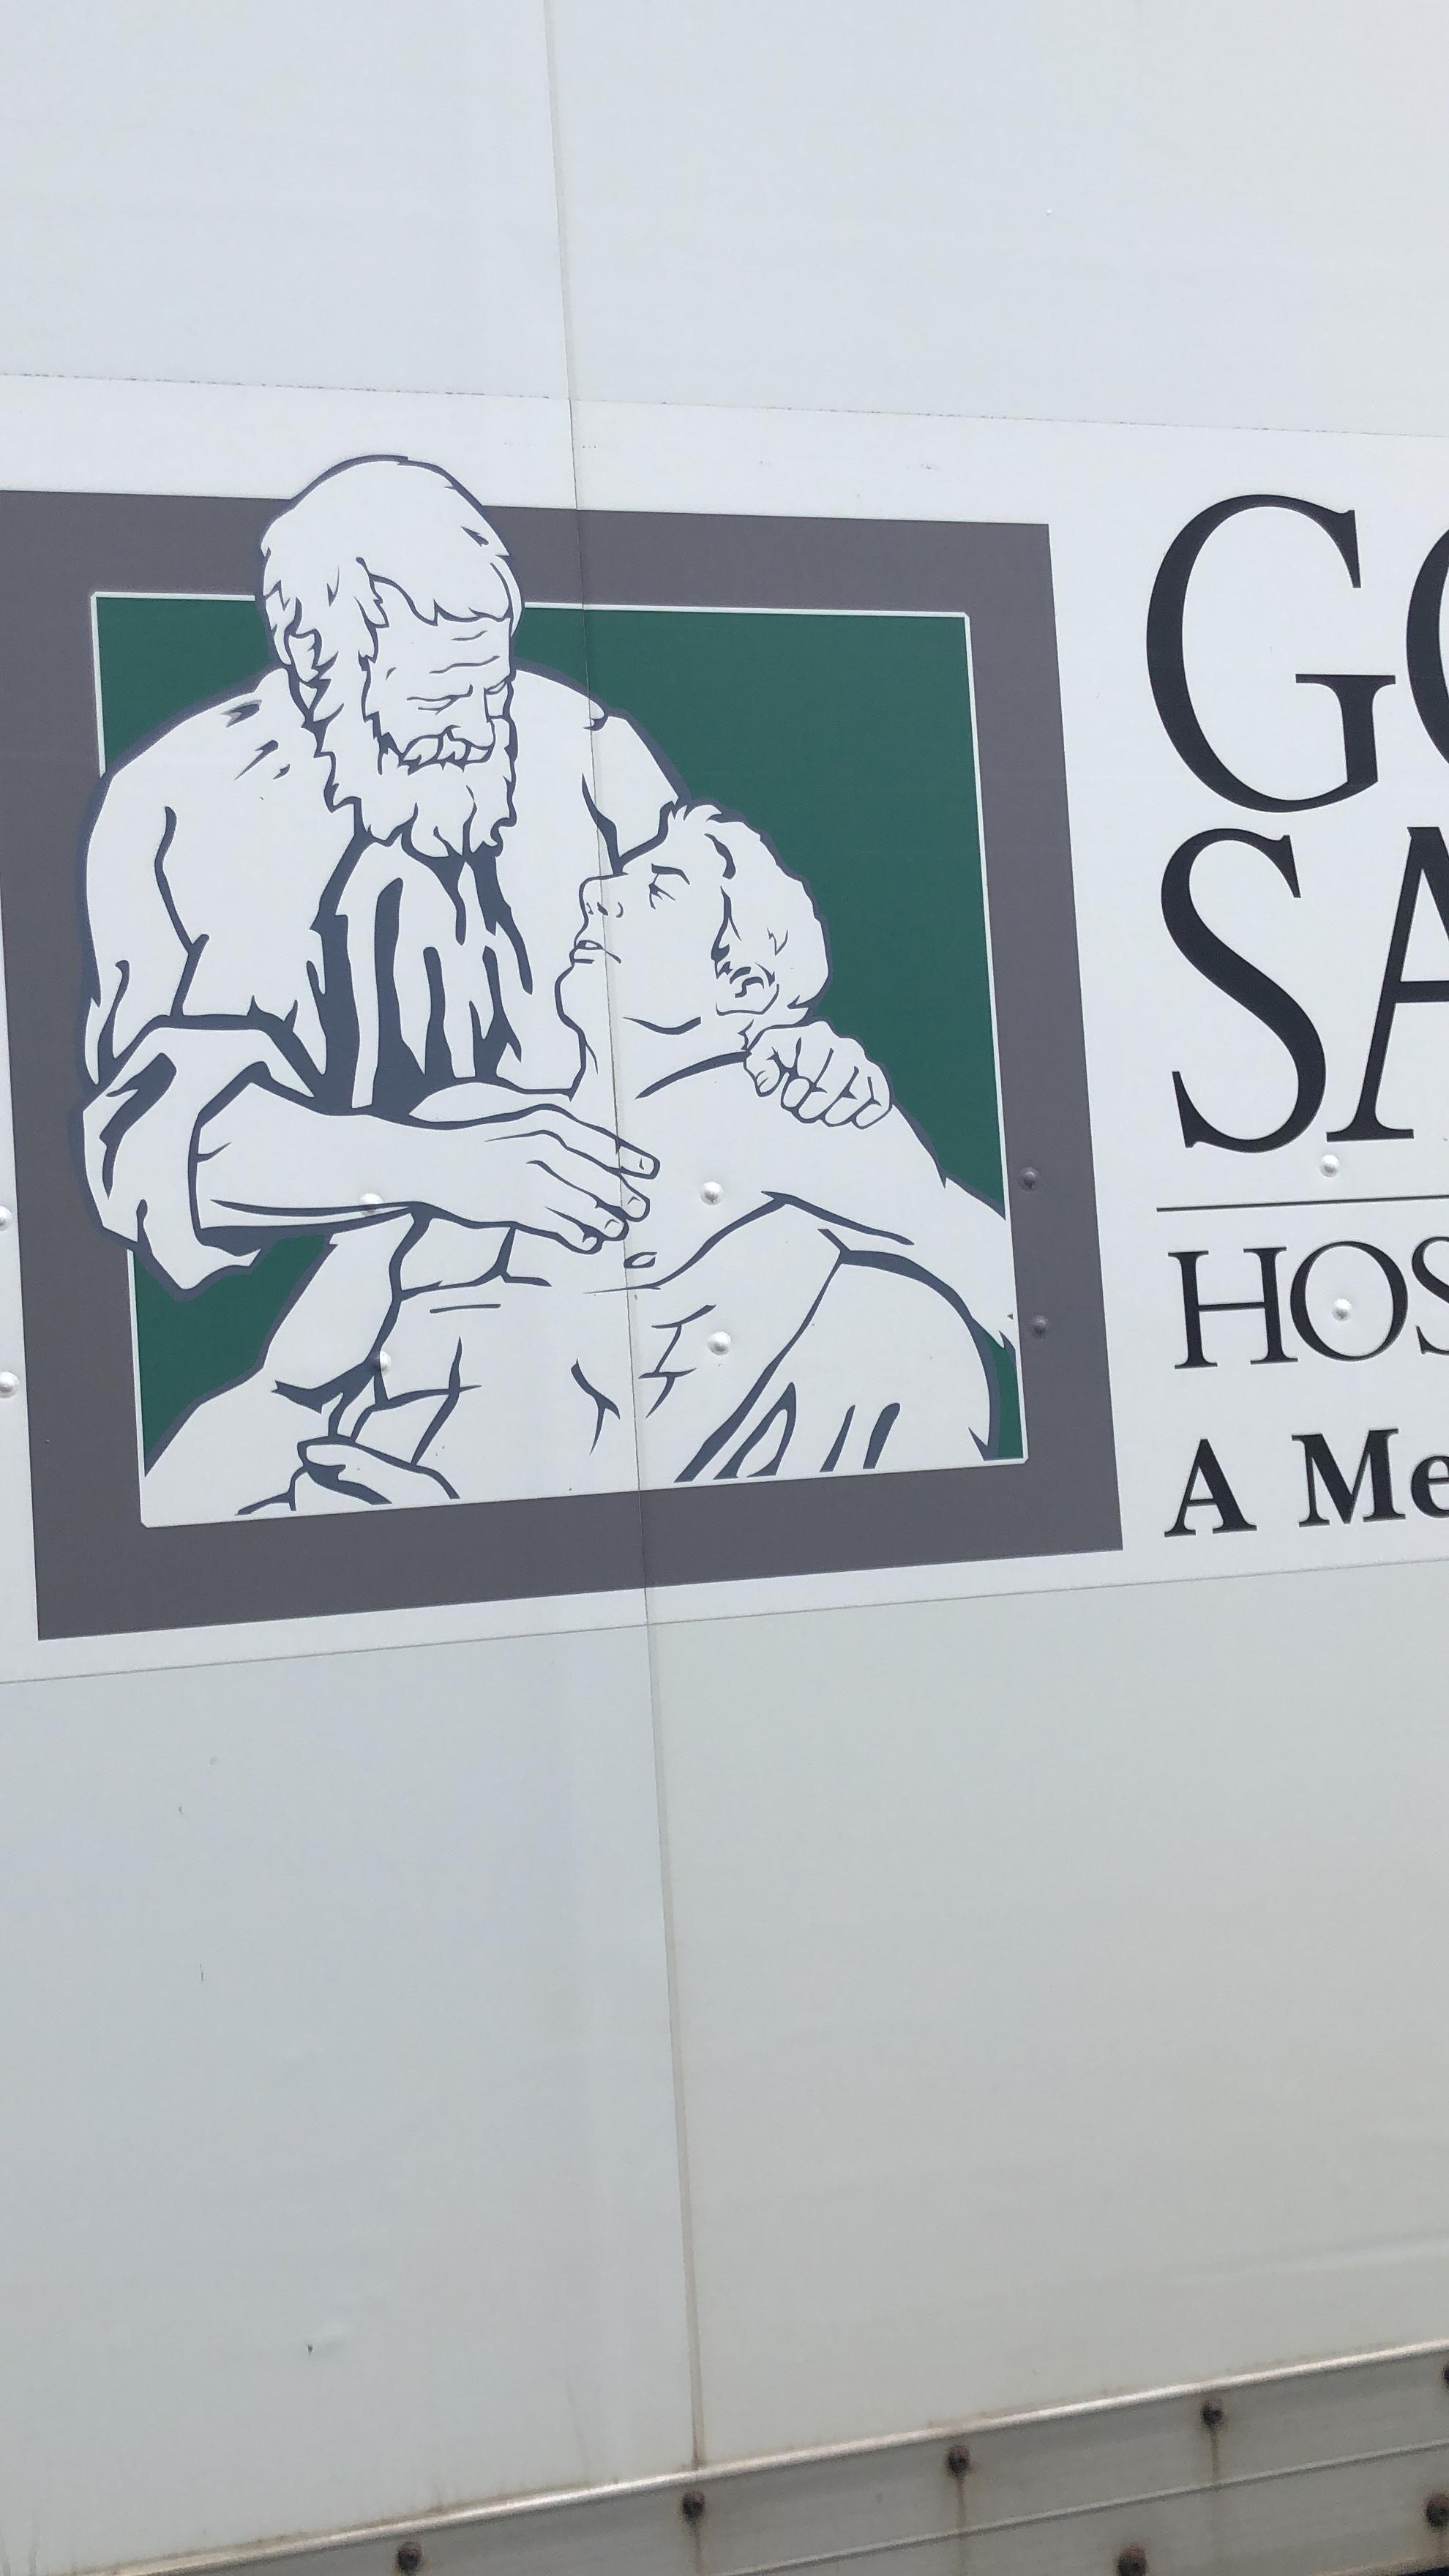 Good Samaritan Hospital's logo looks like David Letterman giving a massage to a buff Martin Short.